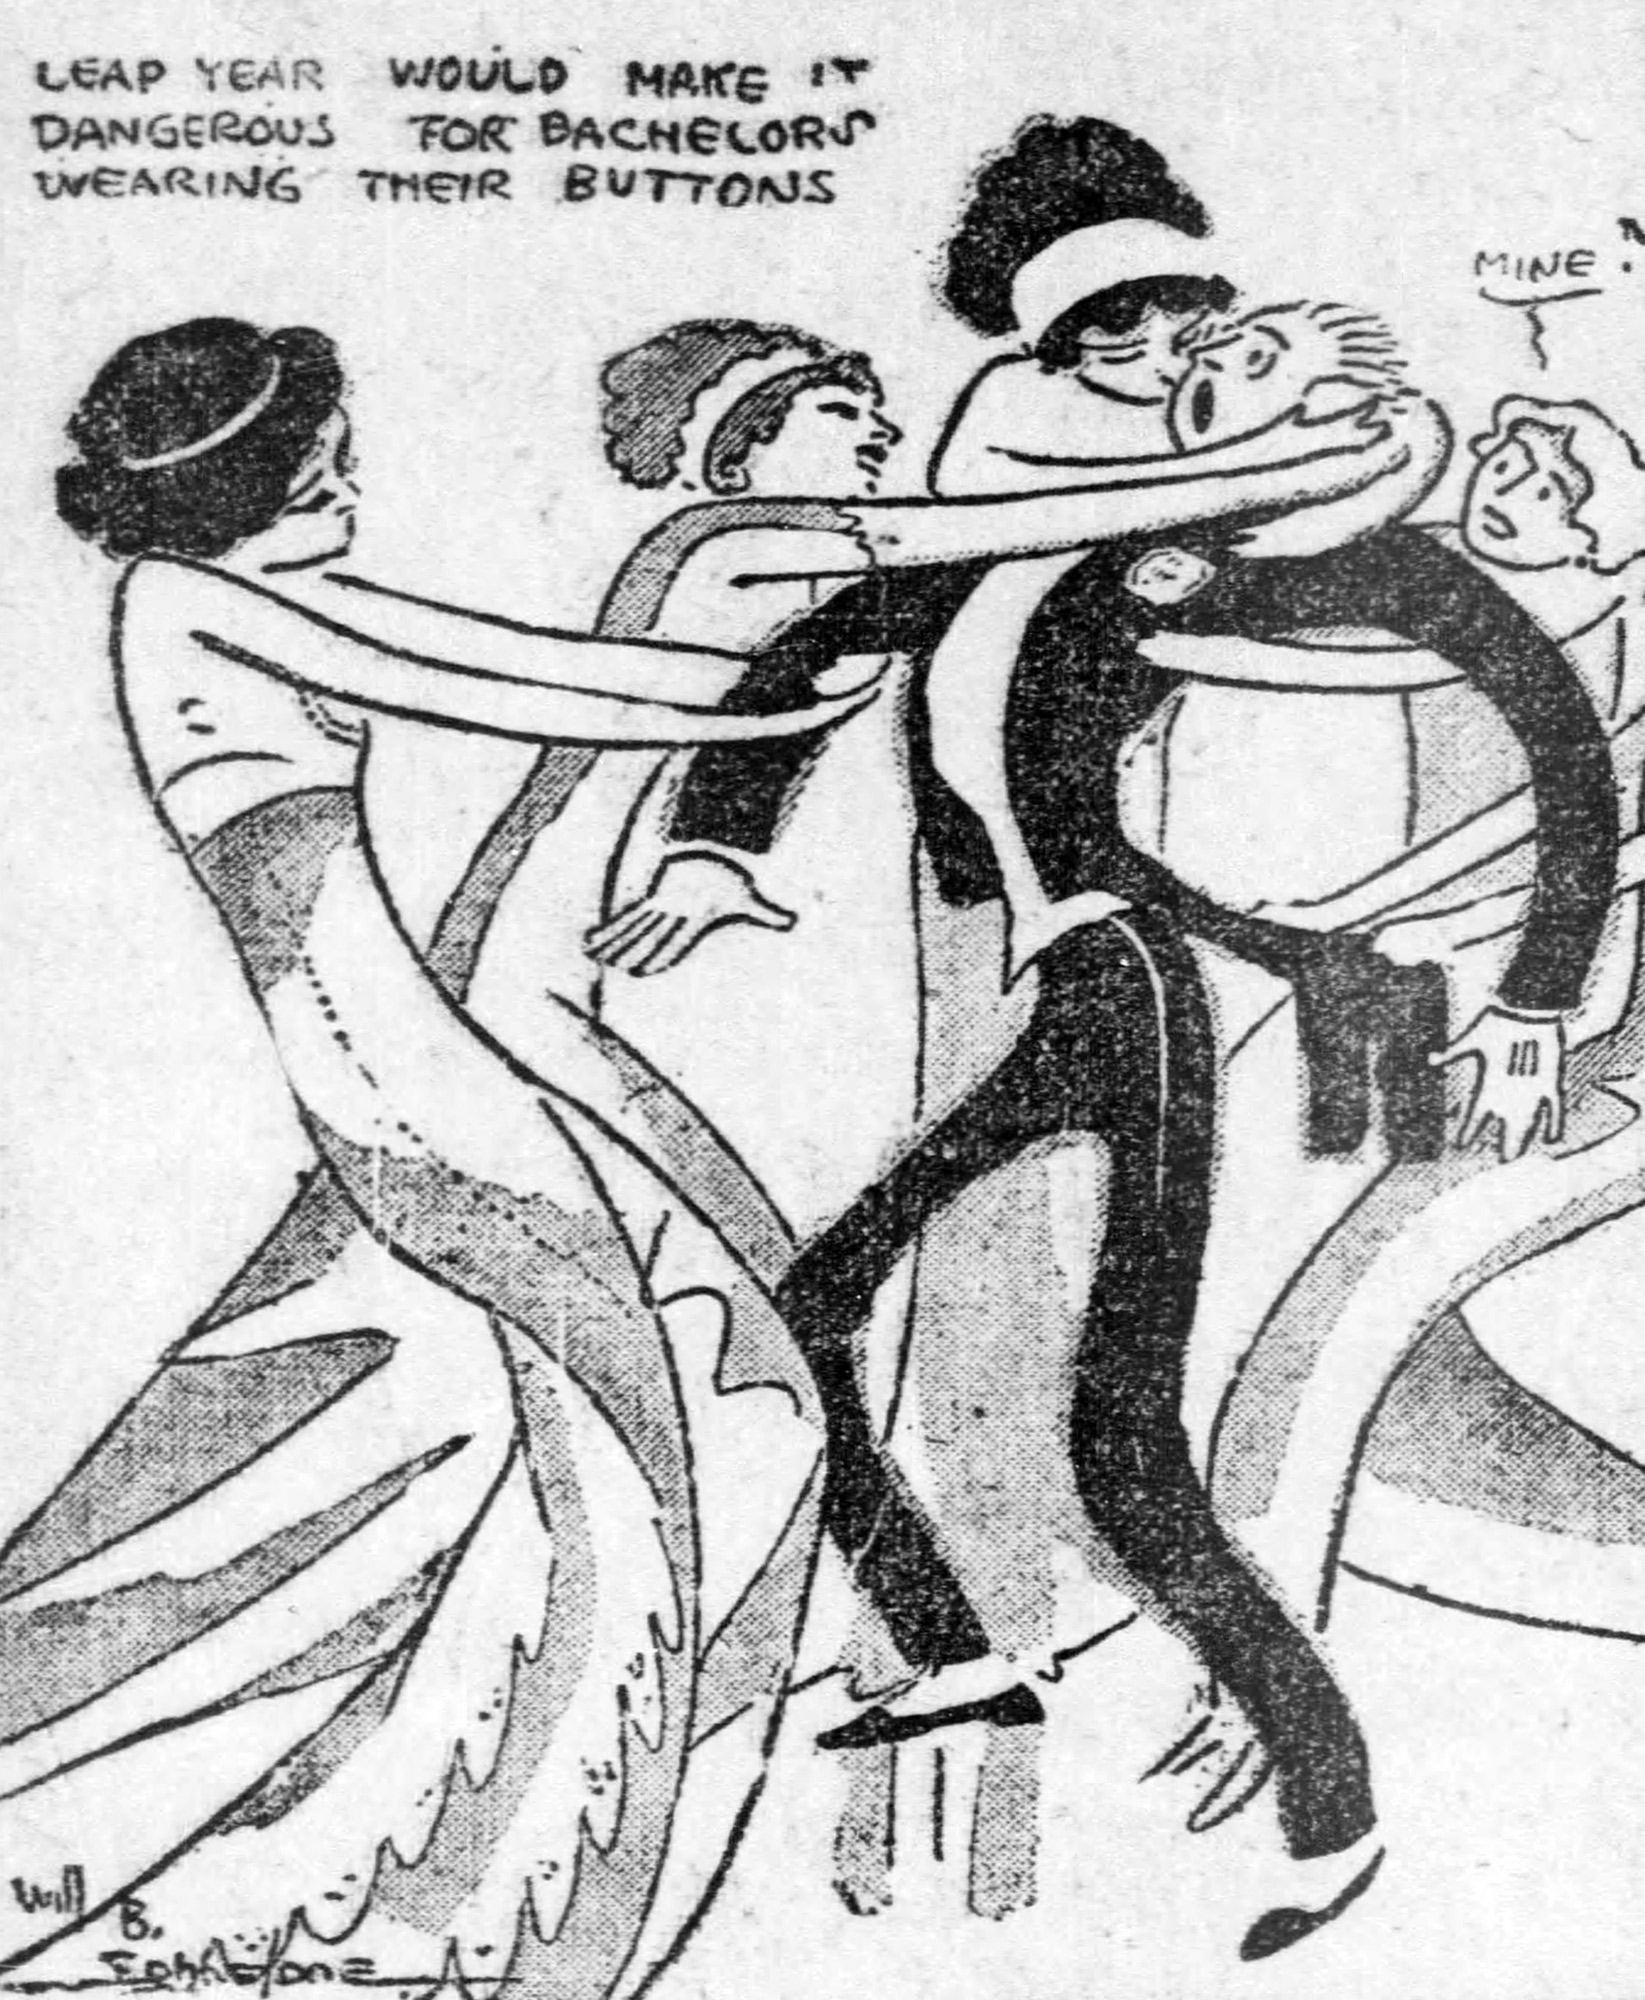 Cartoon accompanying 1912 story on bachelor pins.